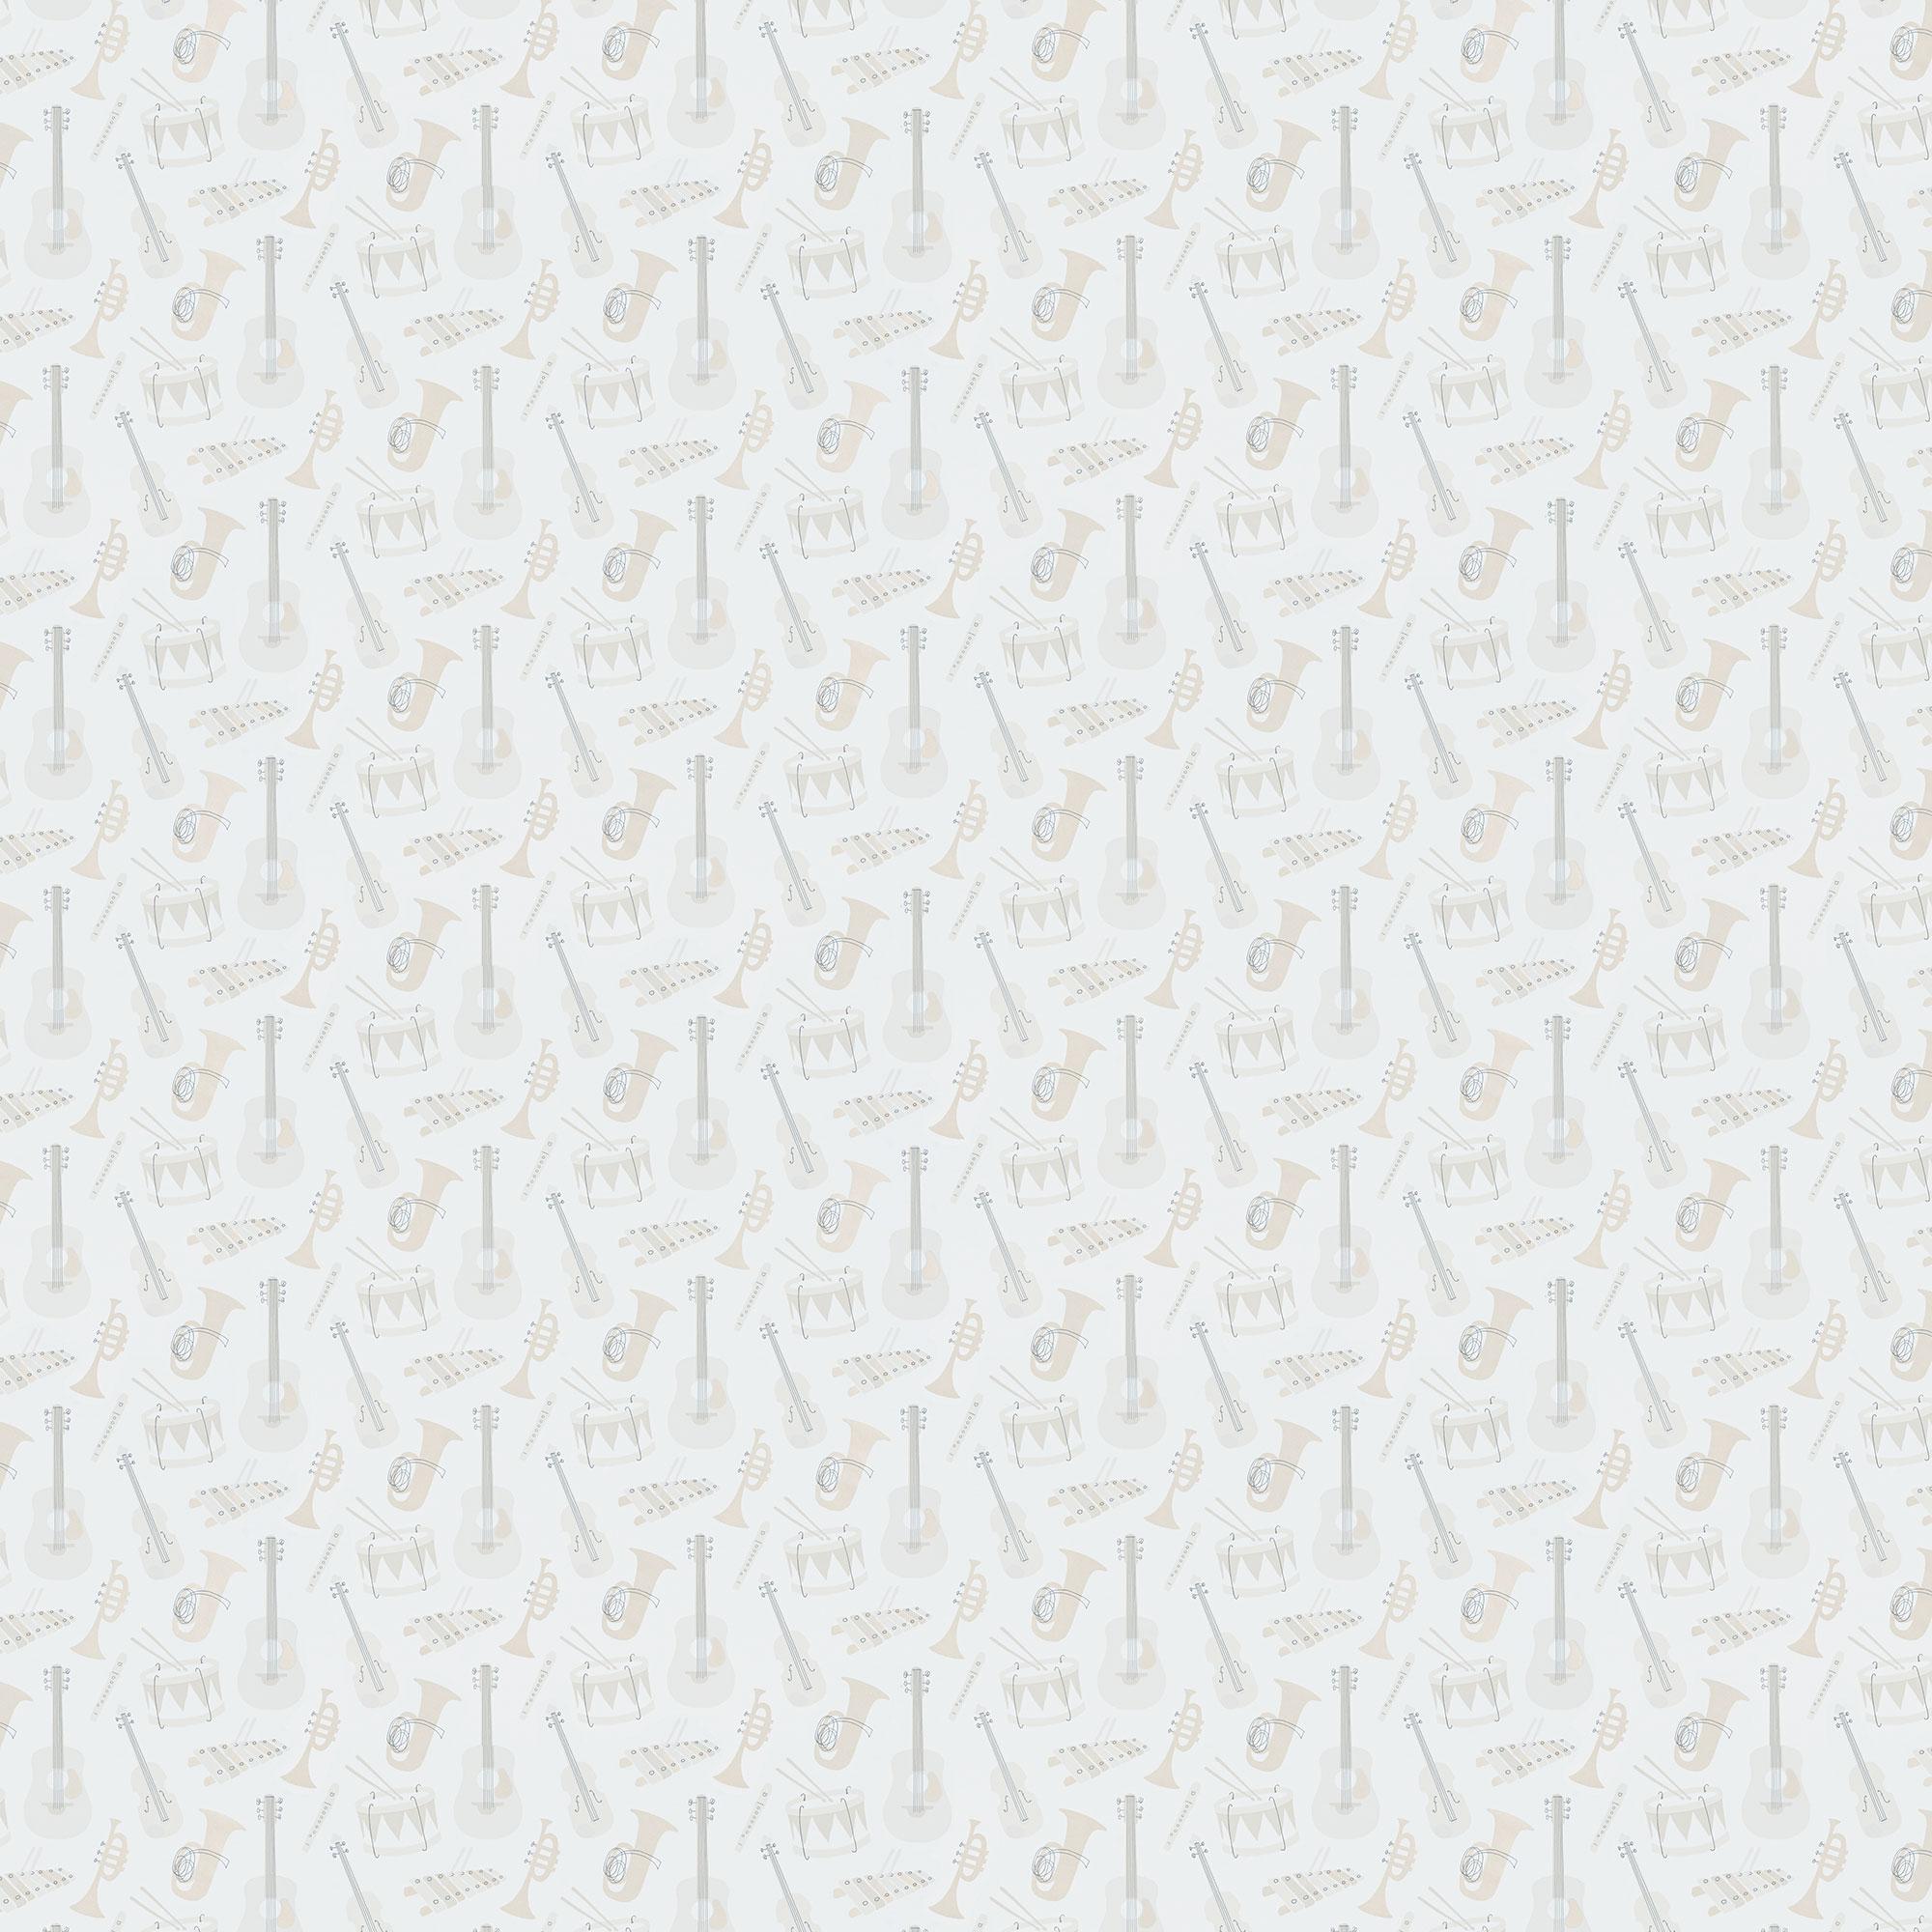 Шведские обои Sandberg,  коллекция Engla & Elliot, артикул783-21